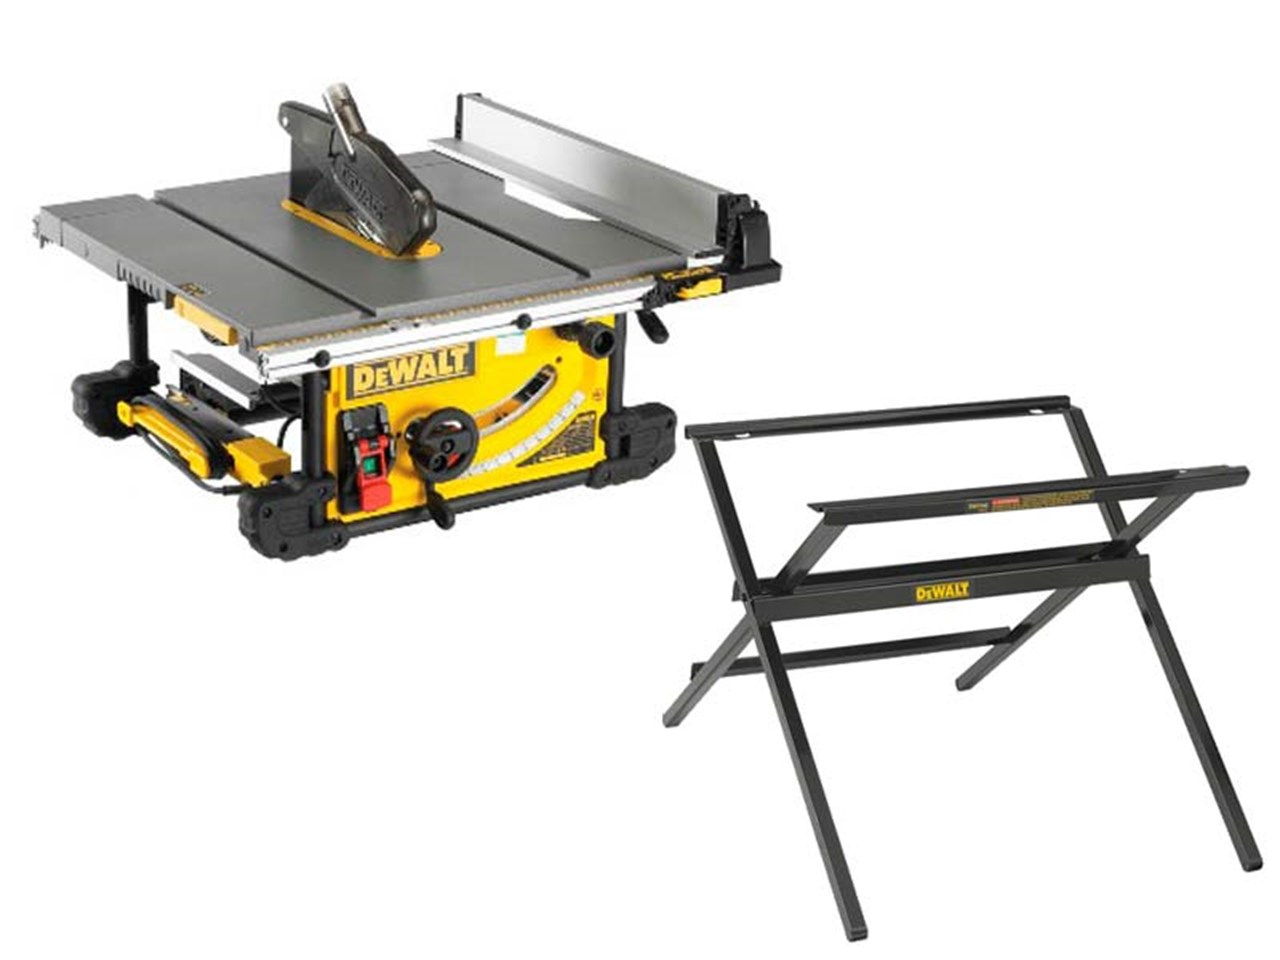 Dewalt Dwe7491dwe74912 240v 250mm Table Saw And Scissor